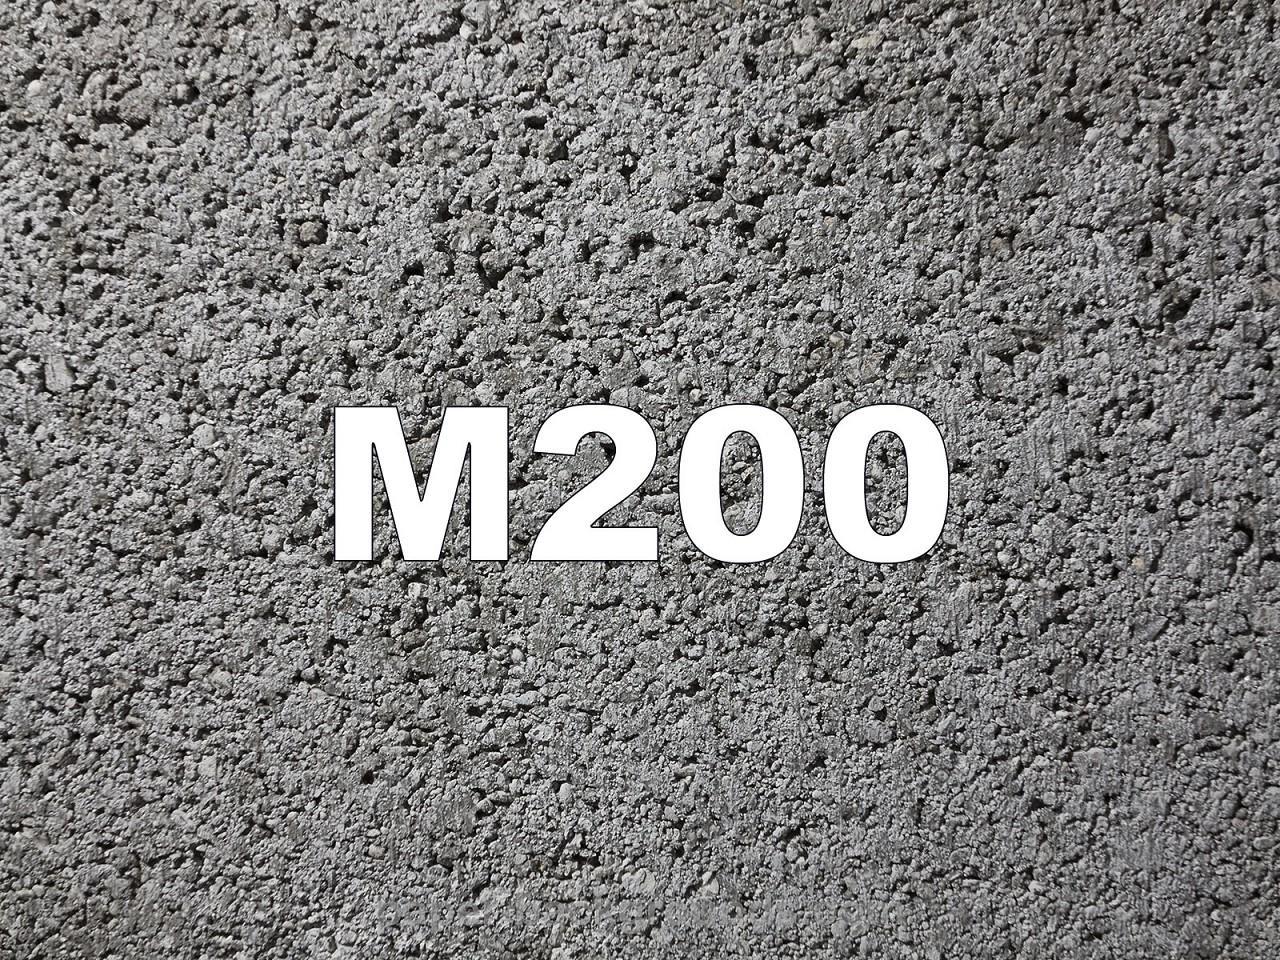 Бетон М200 полностью подходит для заливки фундамента бани